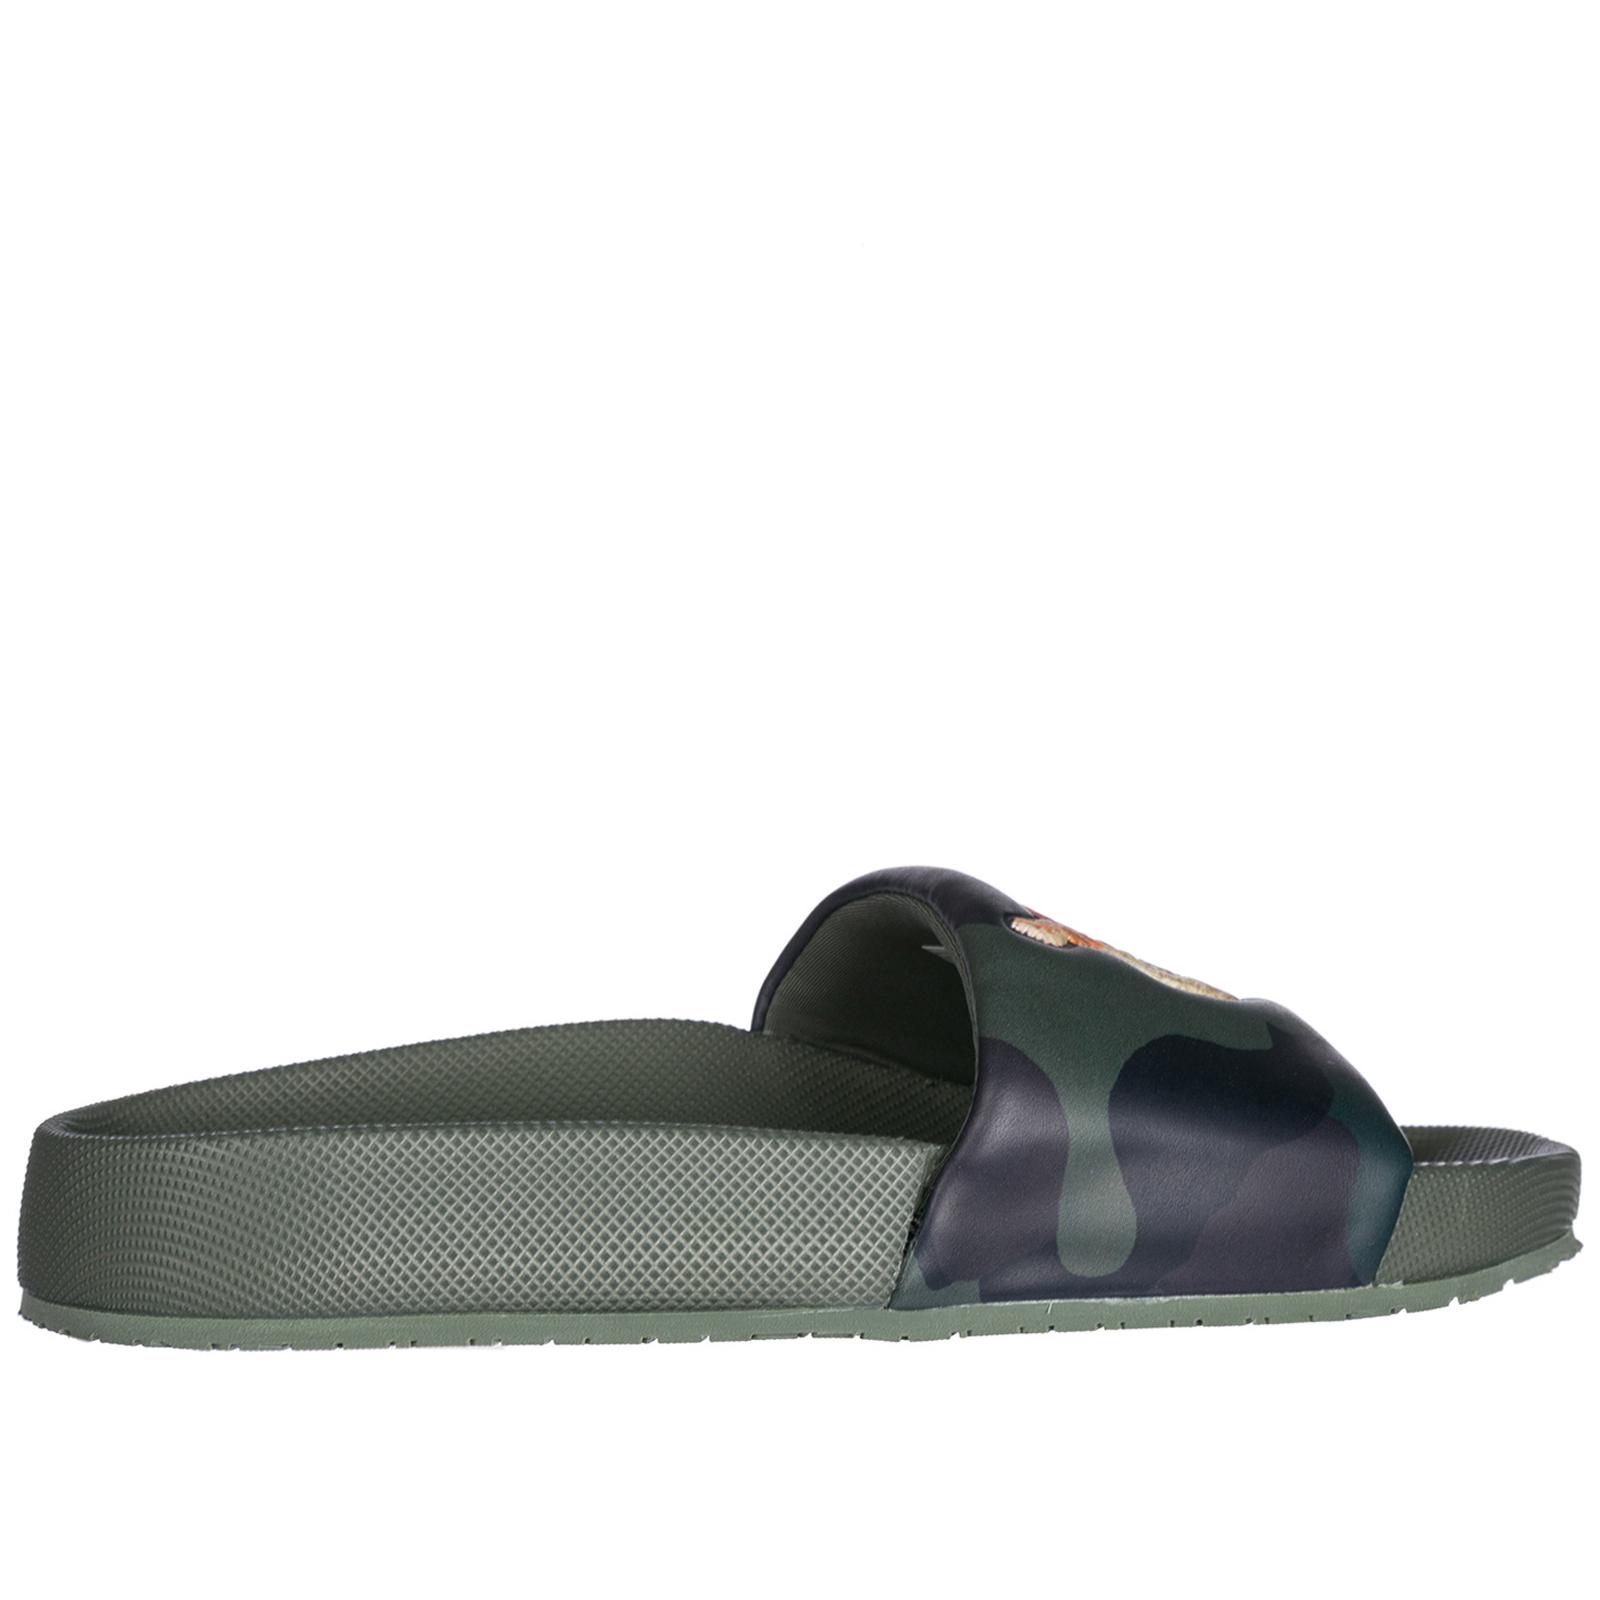 4ec5076cc Polo Ralph Lauren Men s slippers sandals rubber